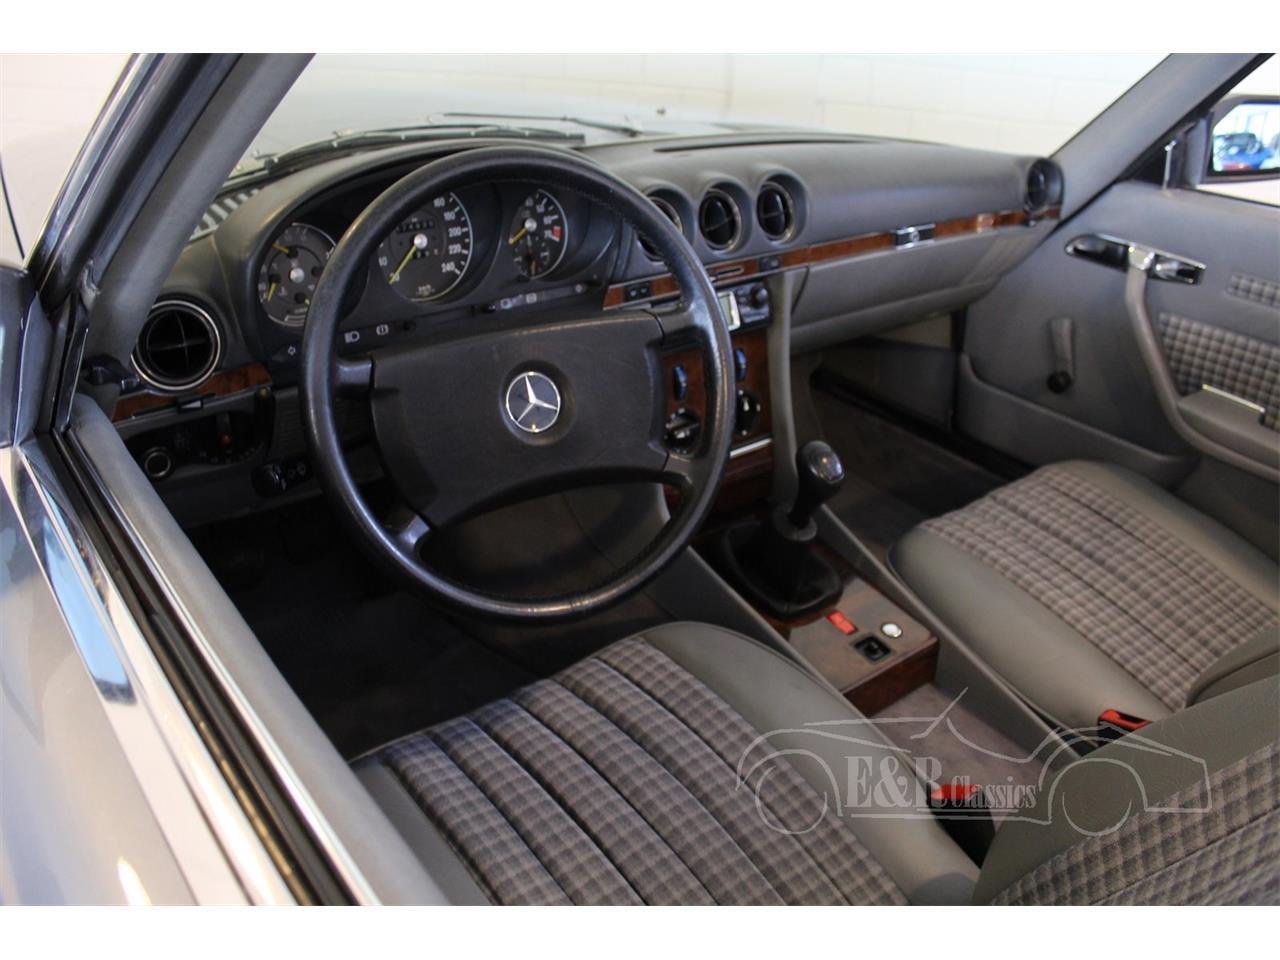 Large Picture of 1983 Mercedes-Benz 280SL - $34,150.00 - QEBS